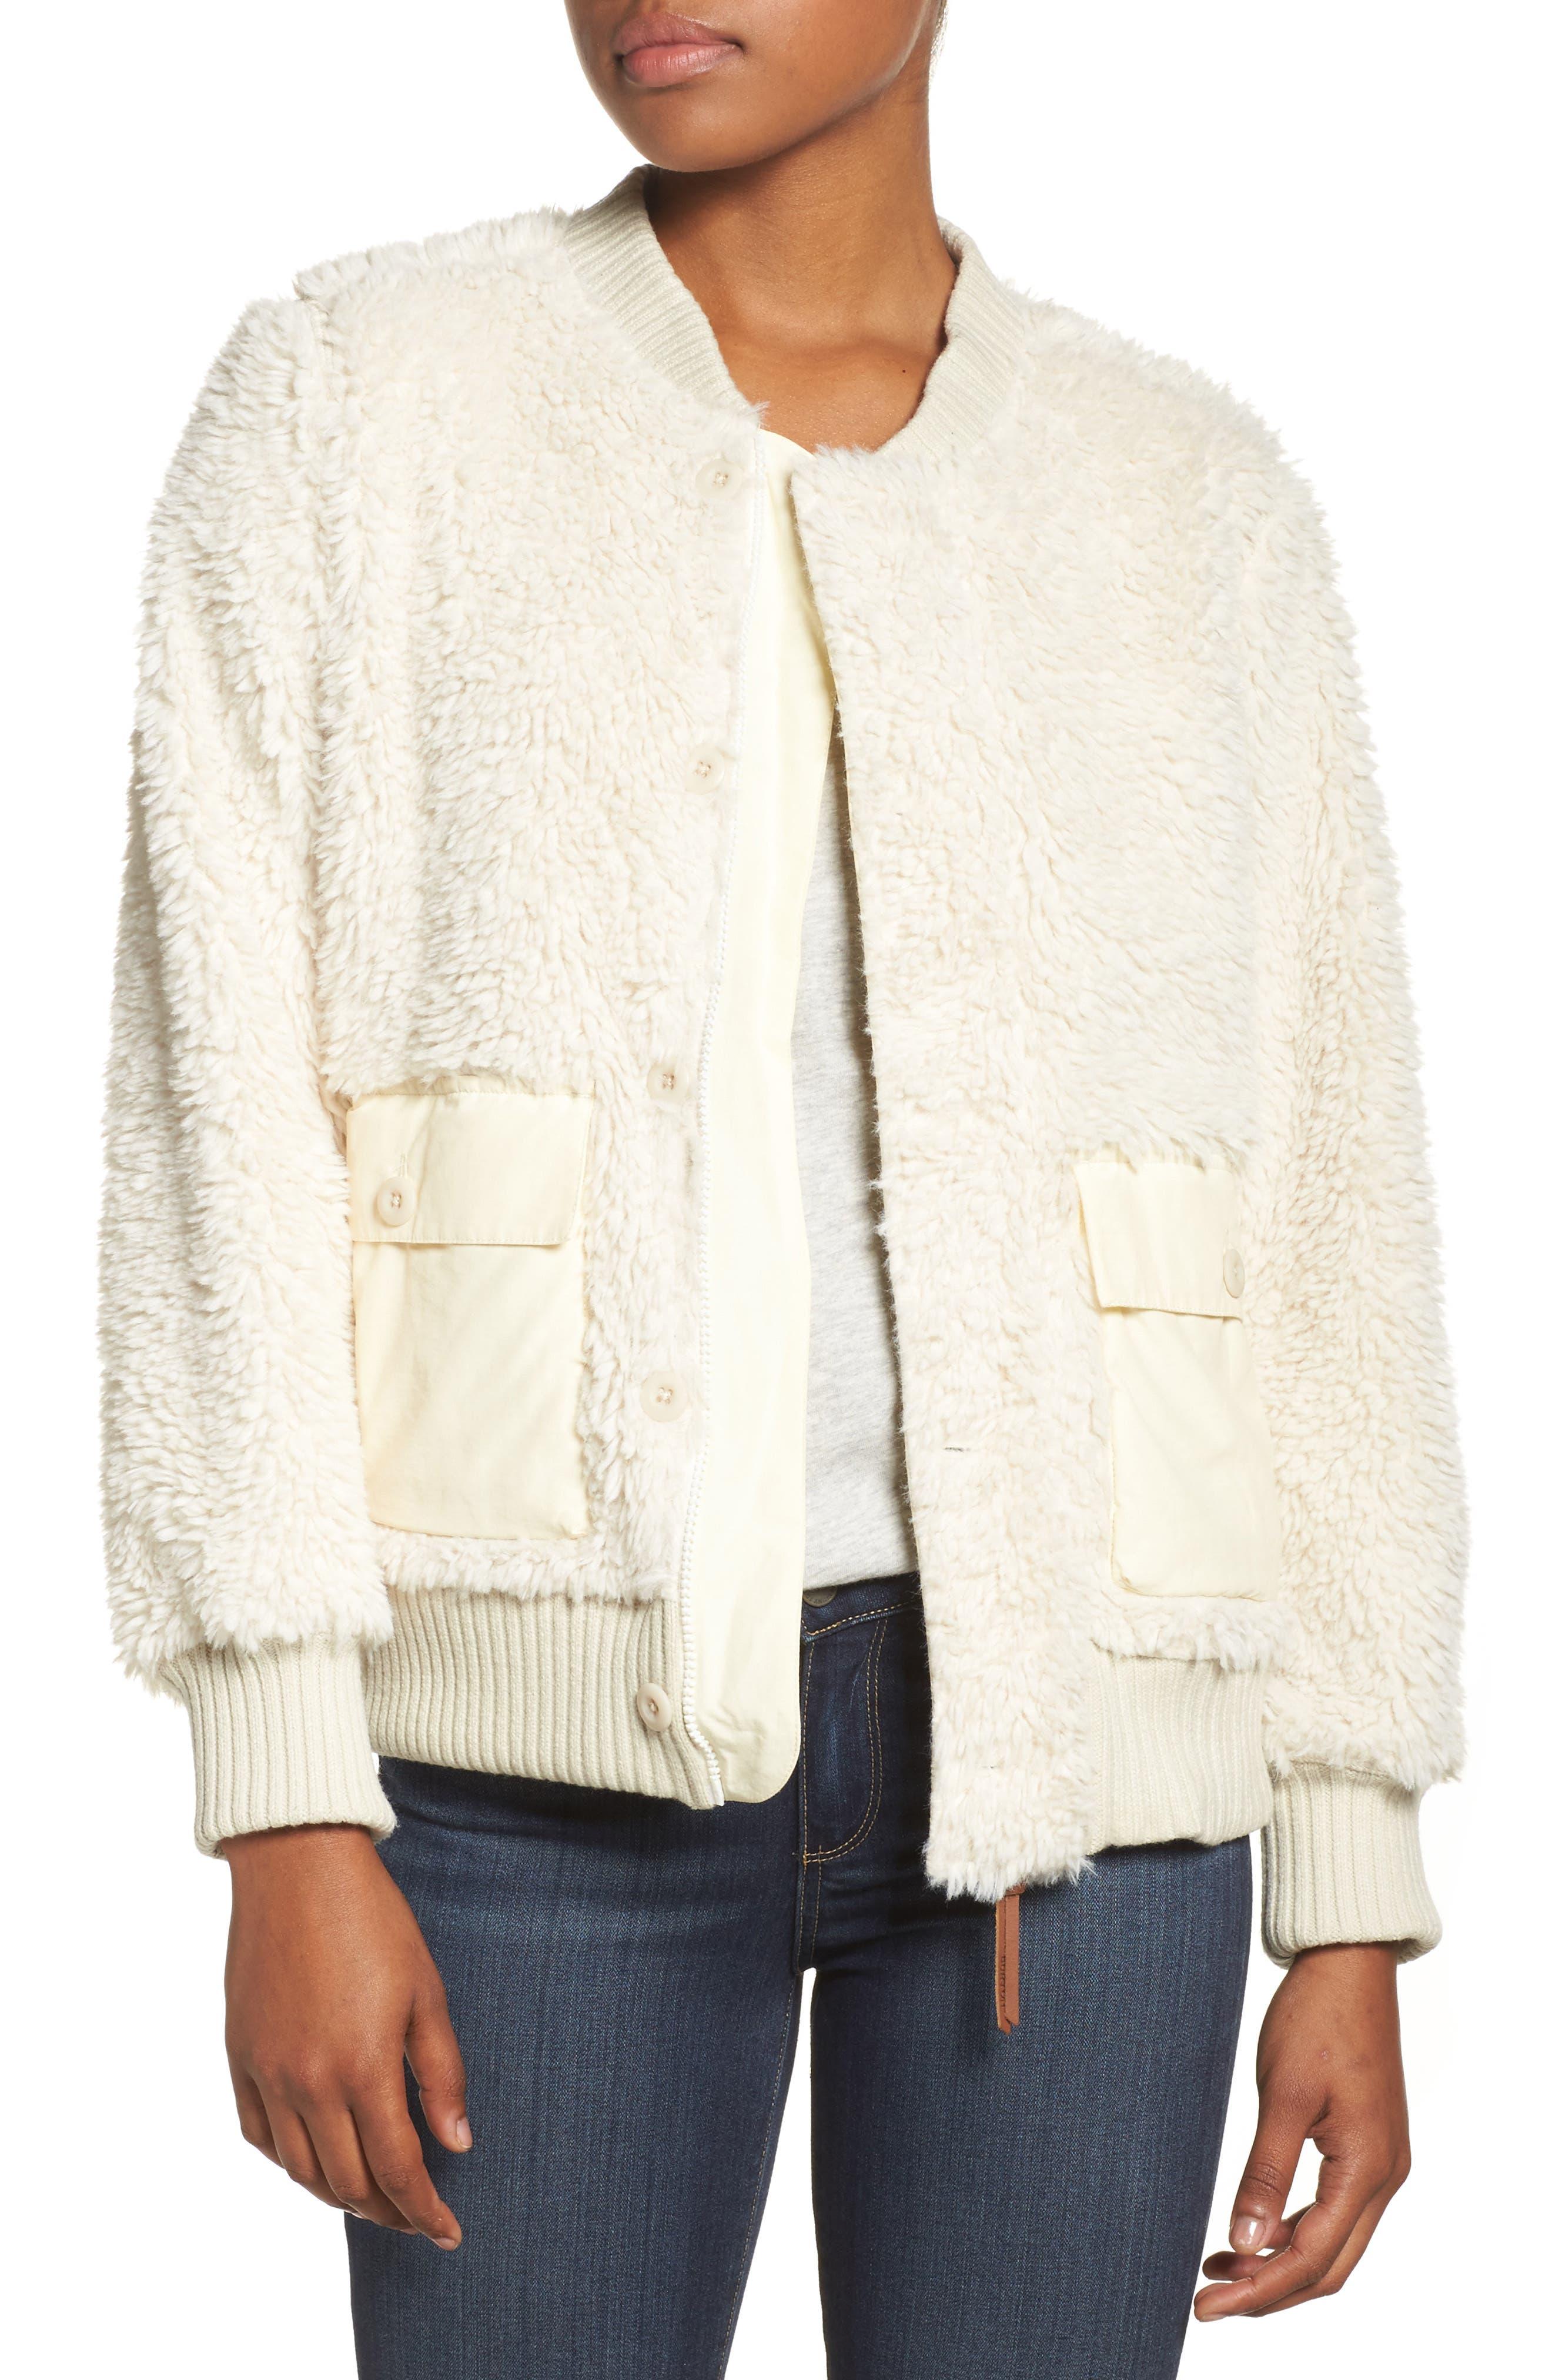 Shawmut High Pile DRYRIDE Thermex Fleece Jacket,                             Main thumbnail 1, color,                             Bone White